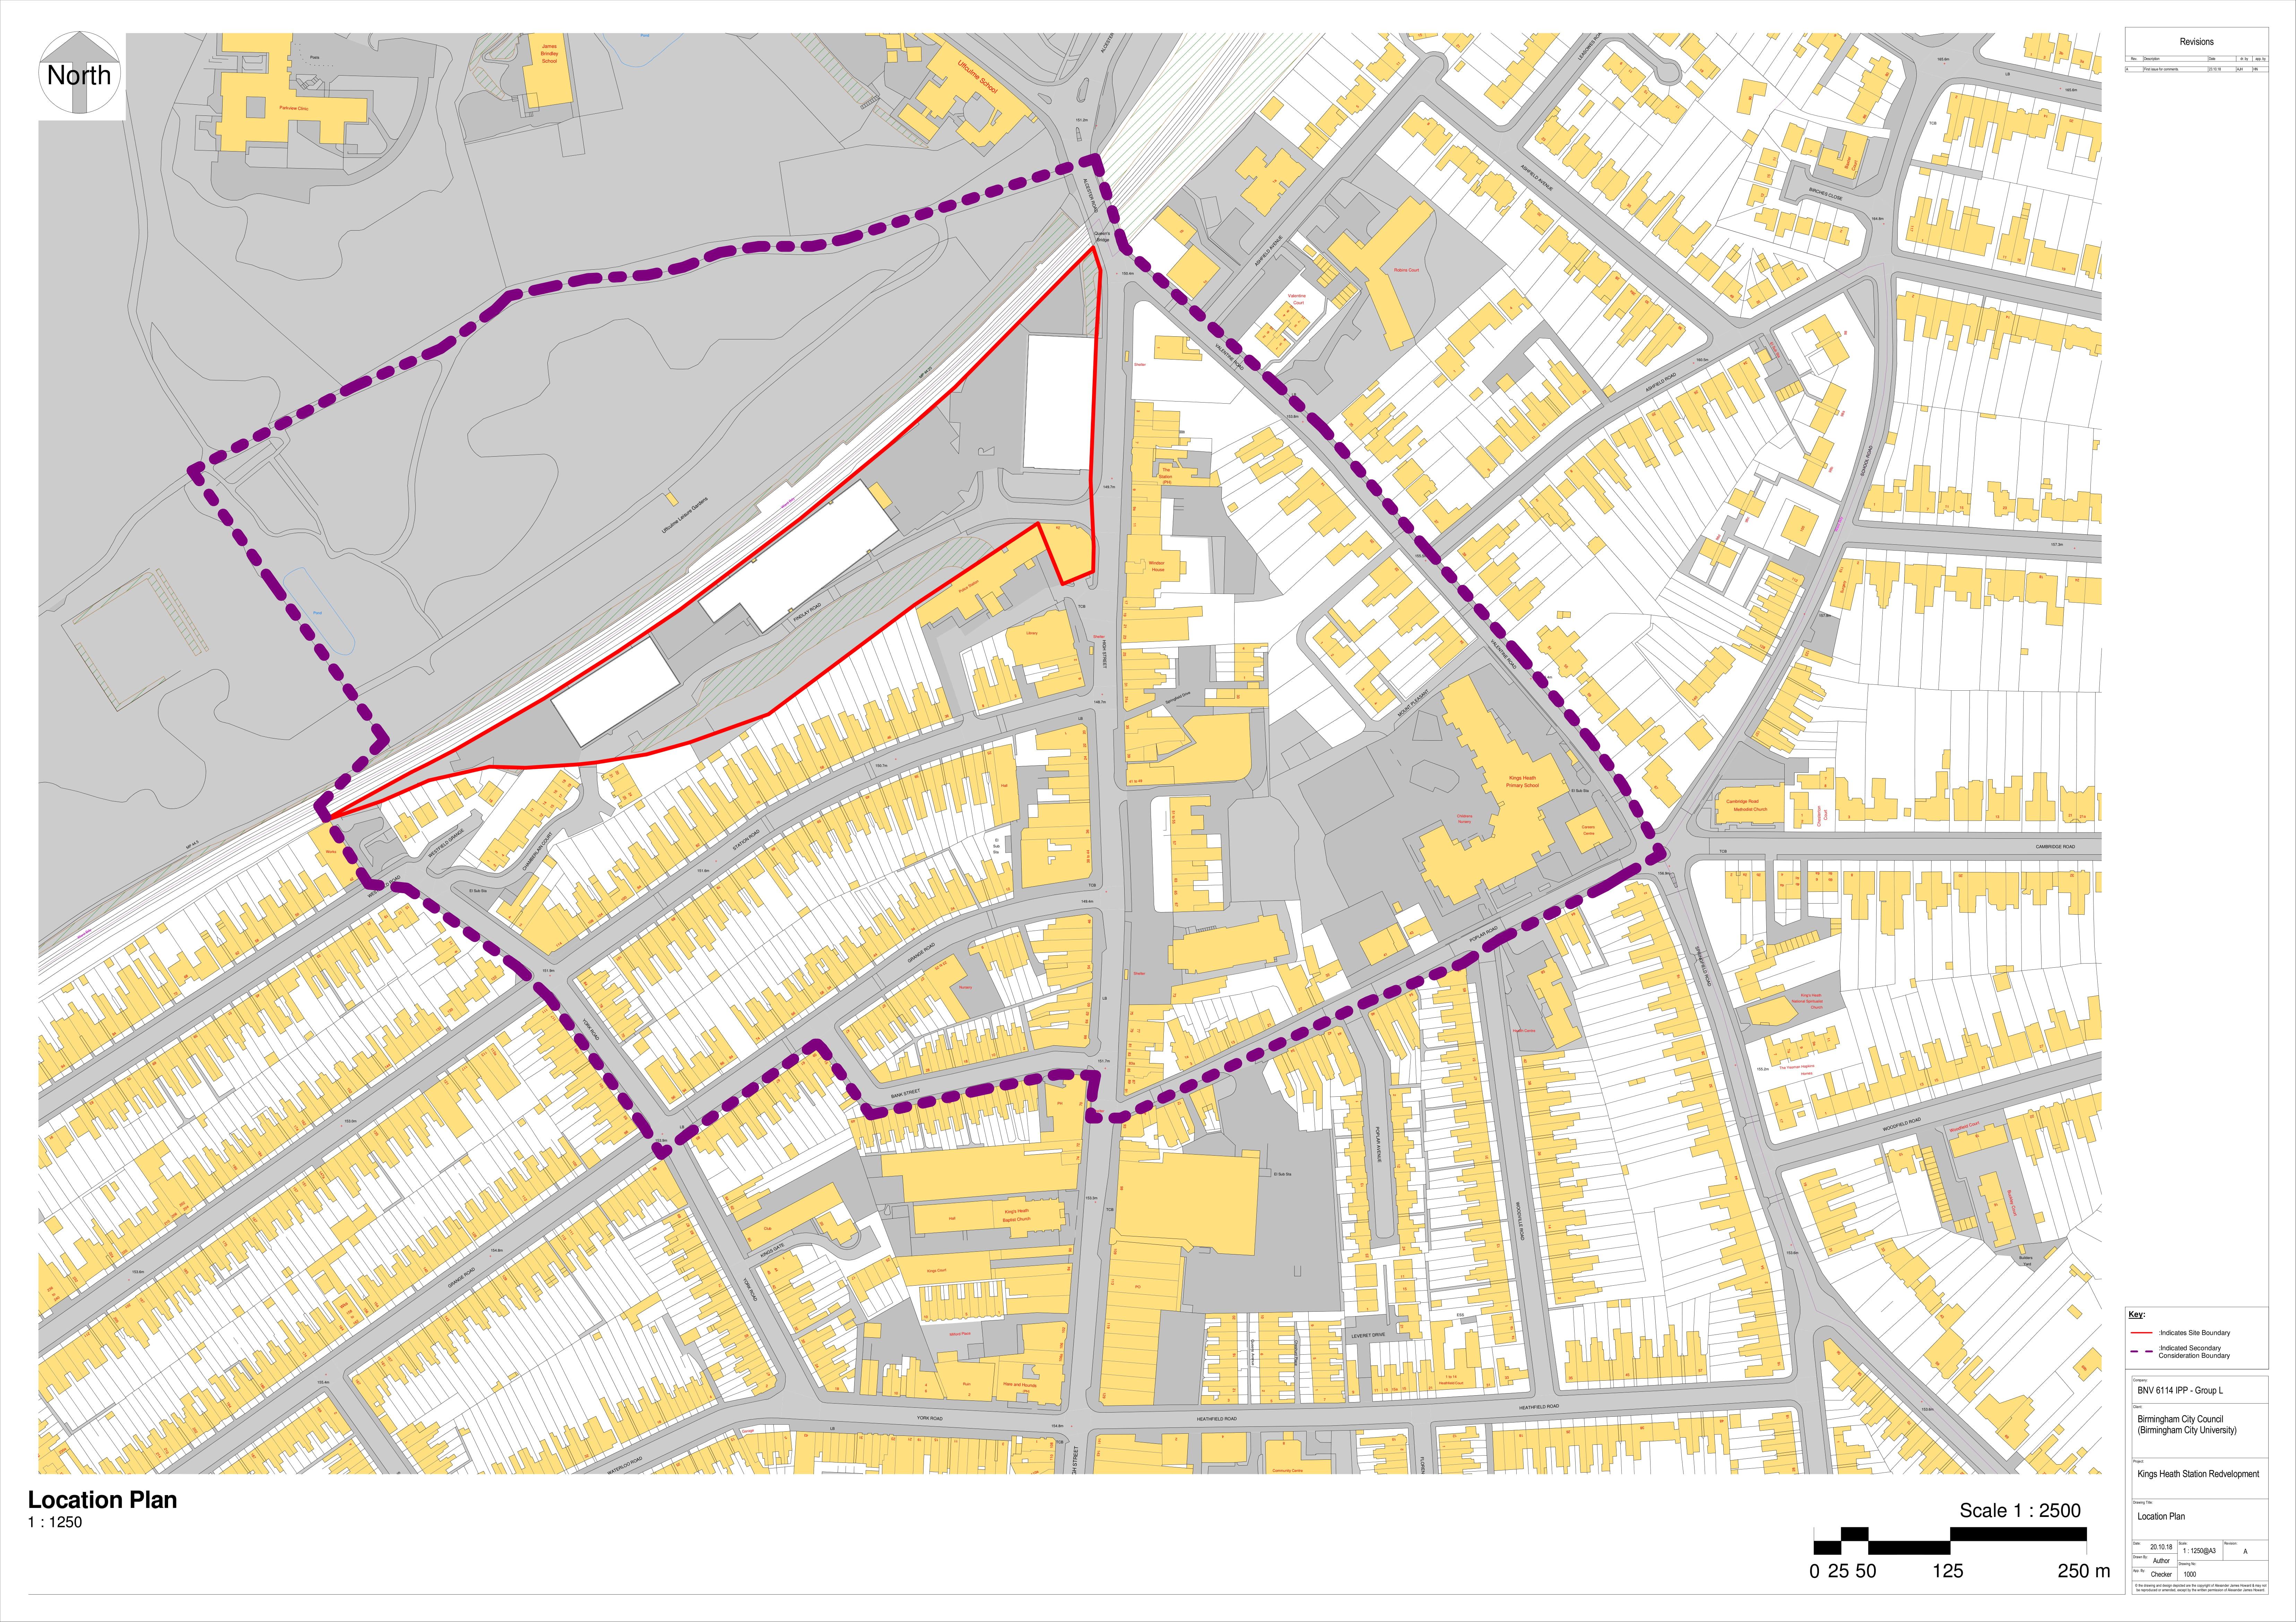 18001-GL-XX-DR-A-1000-A_-_Location_Plan-